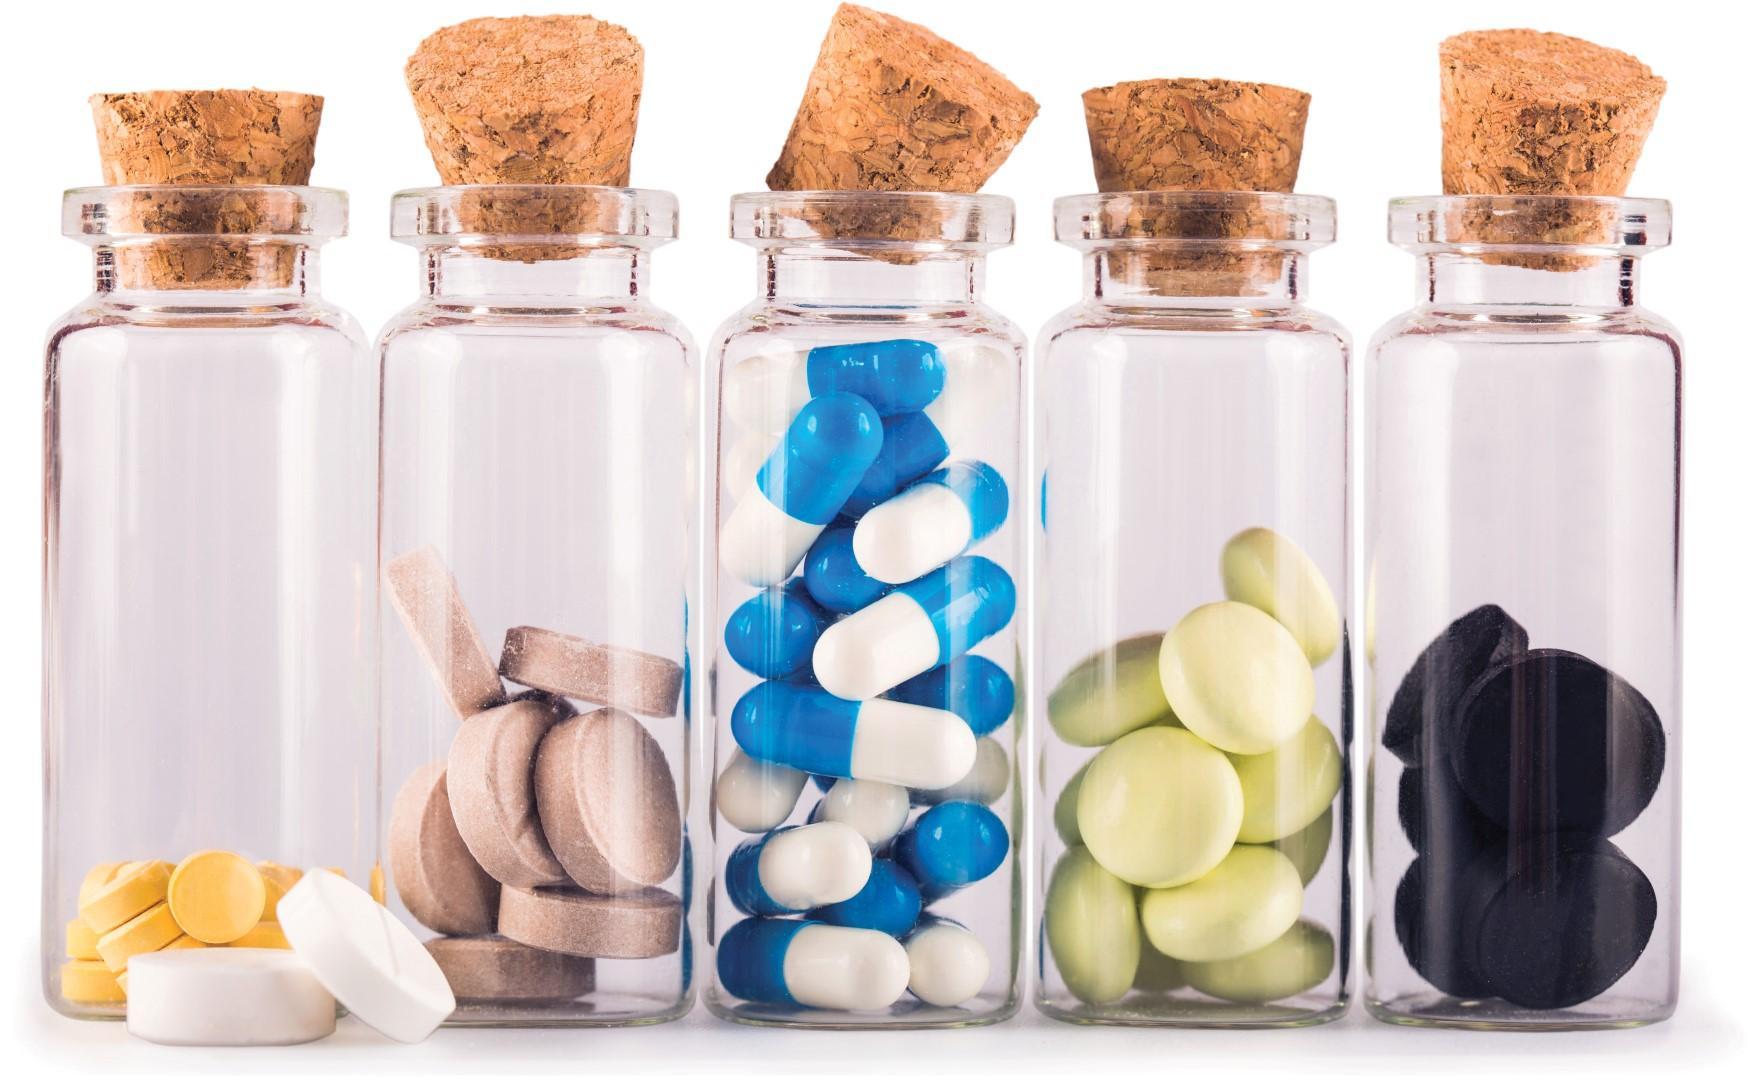 Are We Overdoing Antibiotics?